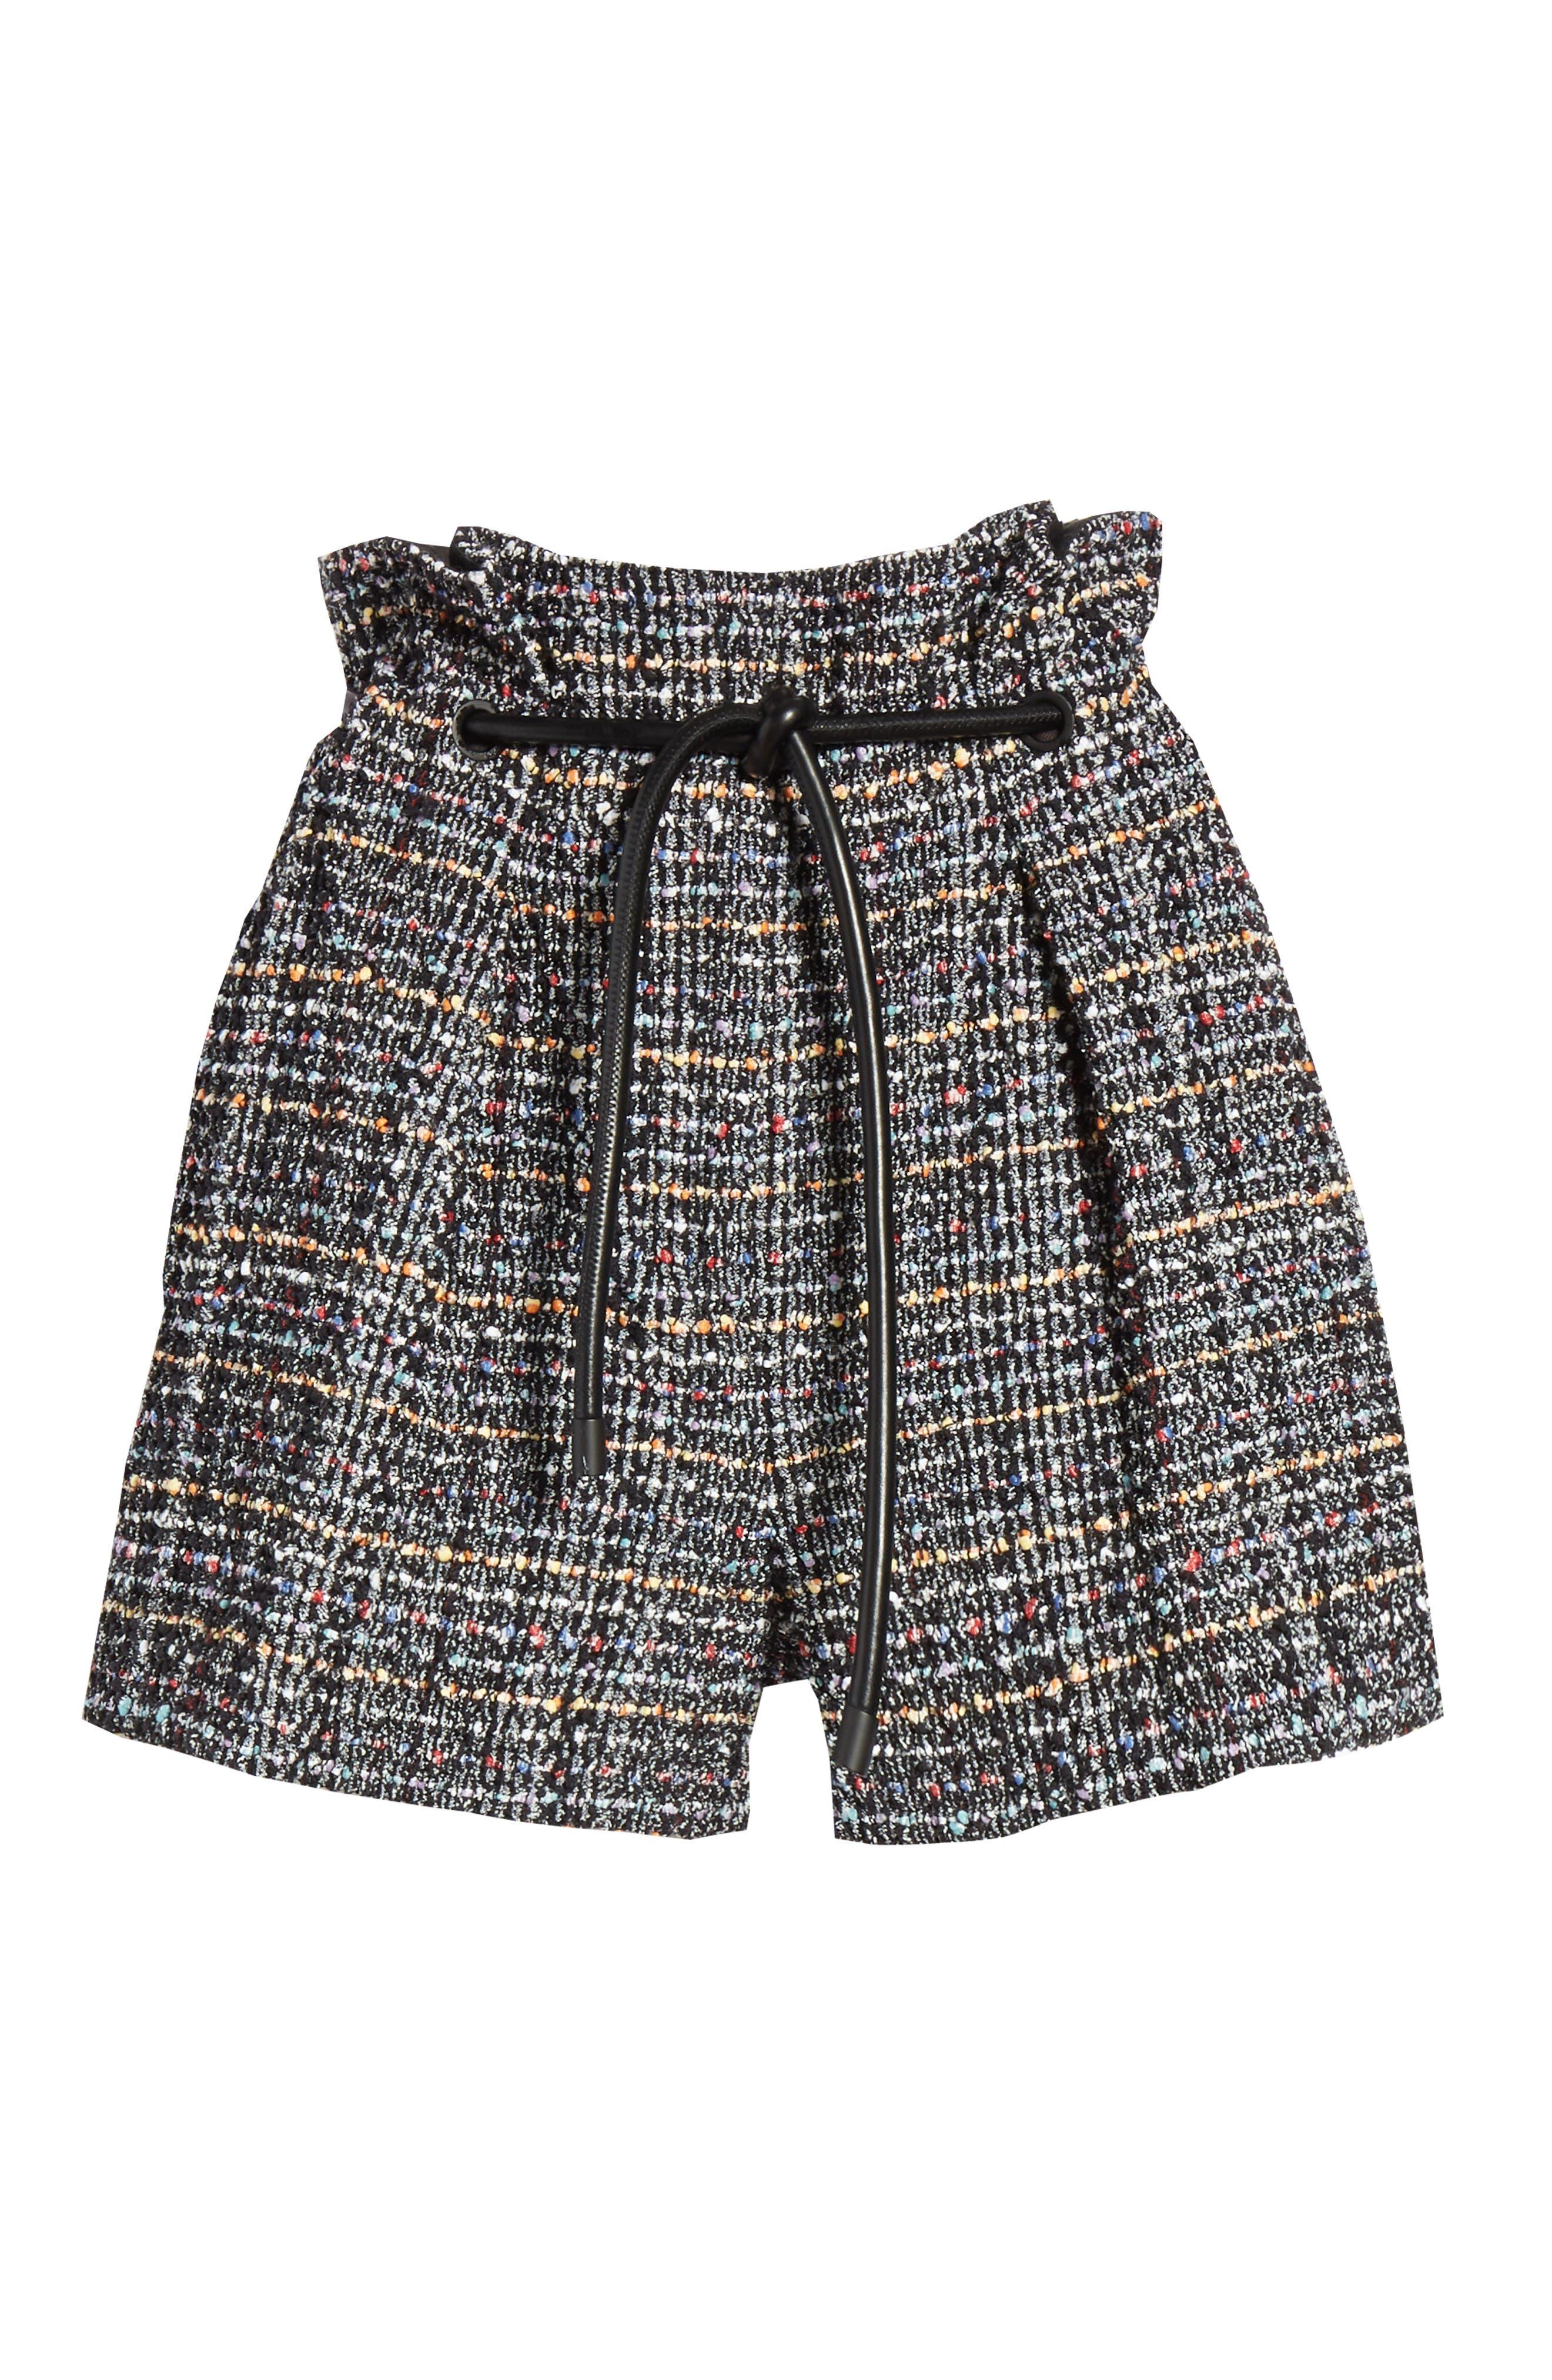 3.1 PHILLIP LIM,                             Paperbag Waist Tweed Shorts,                             Alternate thumbnail 6, color,                             014